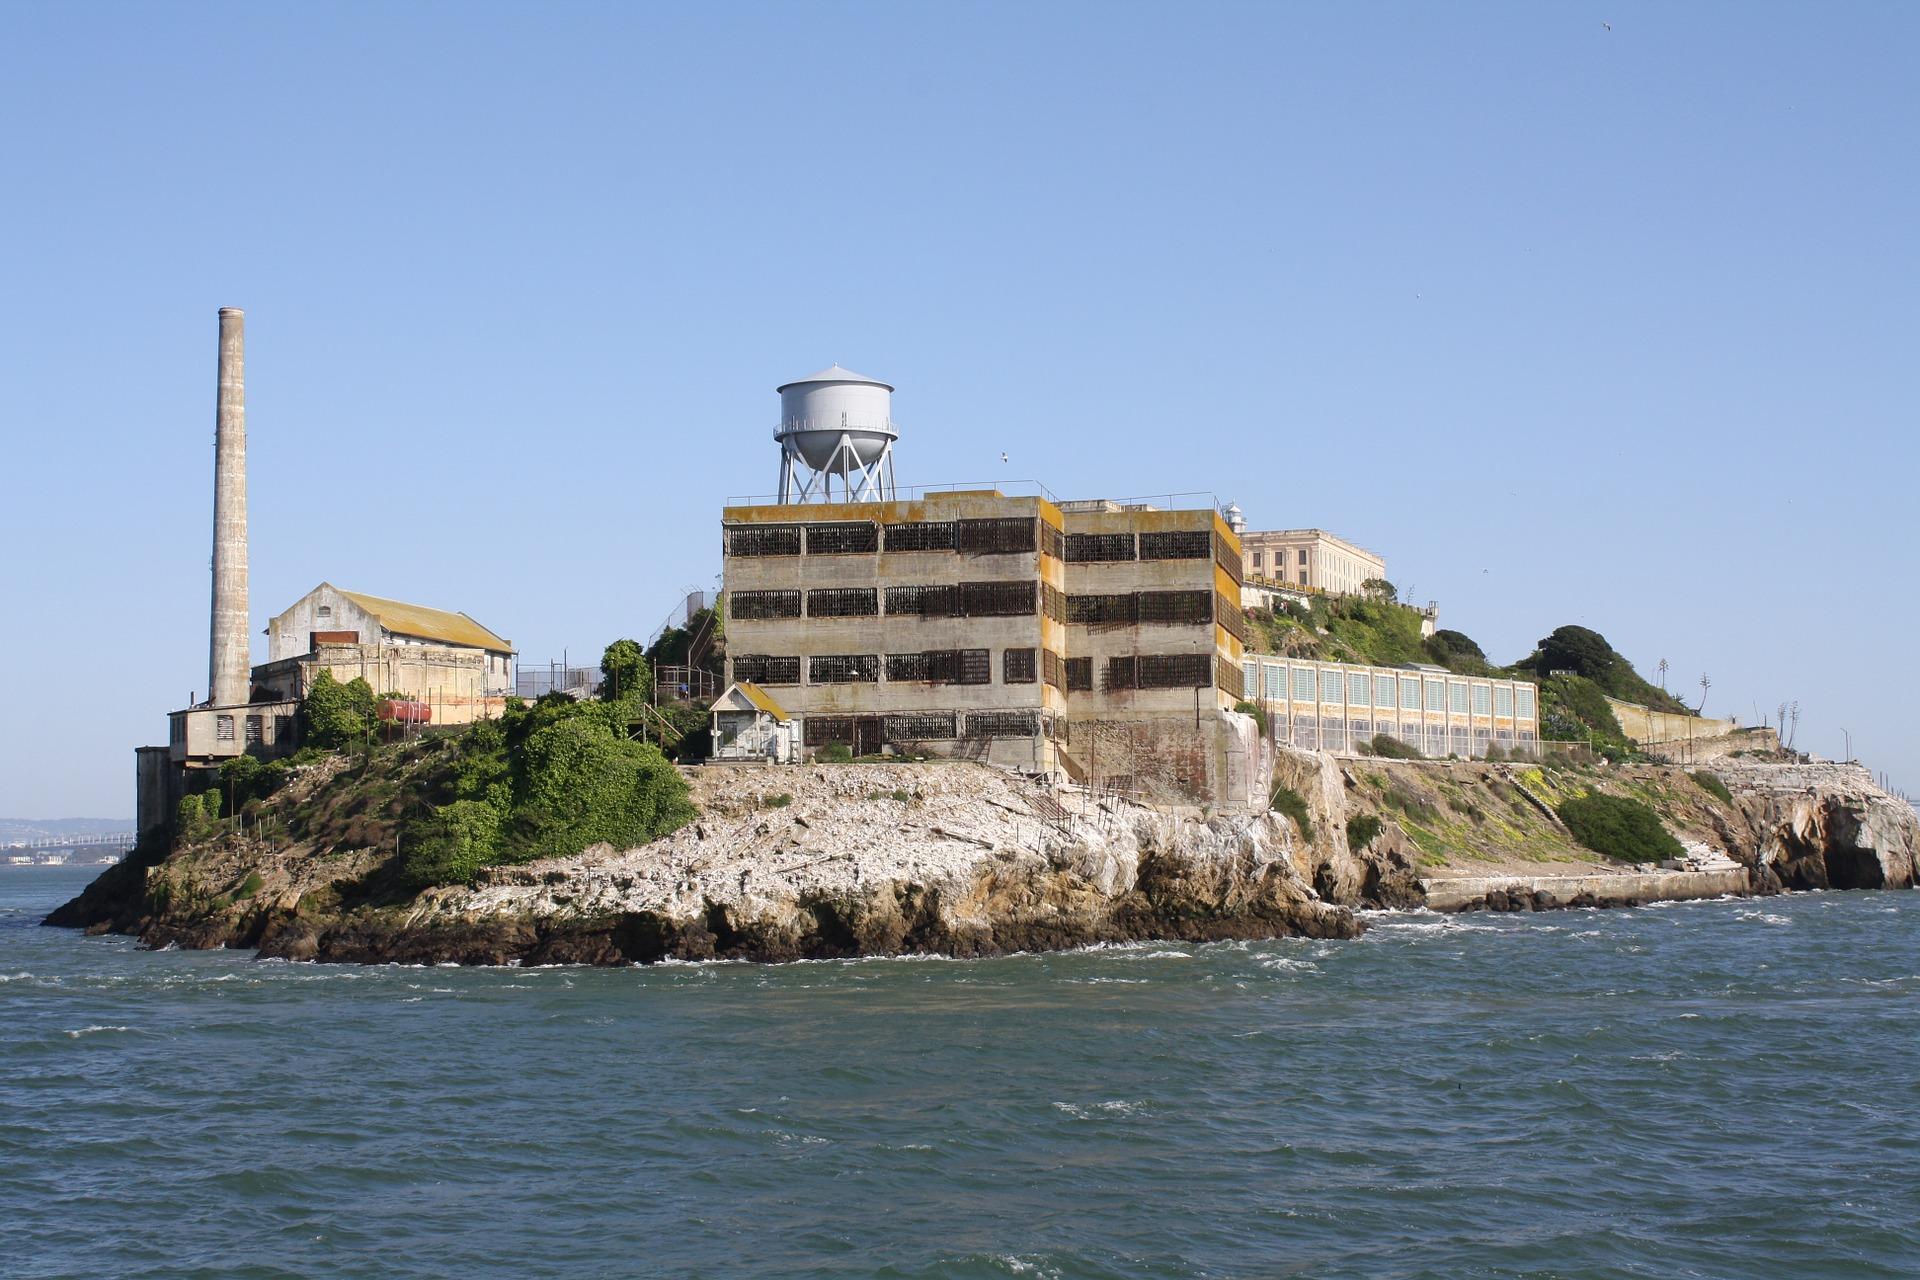 Alcatraz - pixabay free images - https://pixabay.com/en/alcatraz-island-prison-730994/